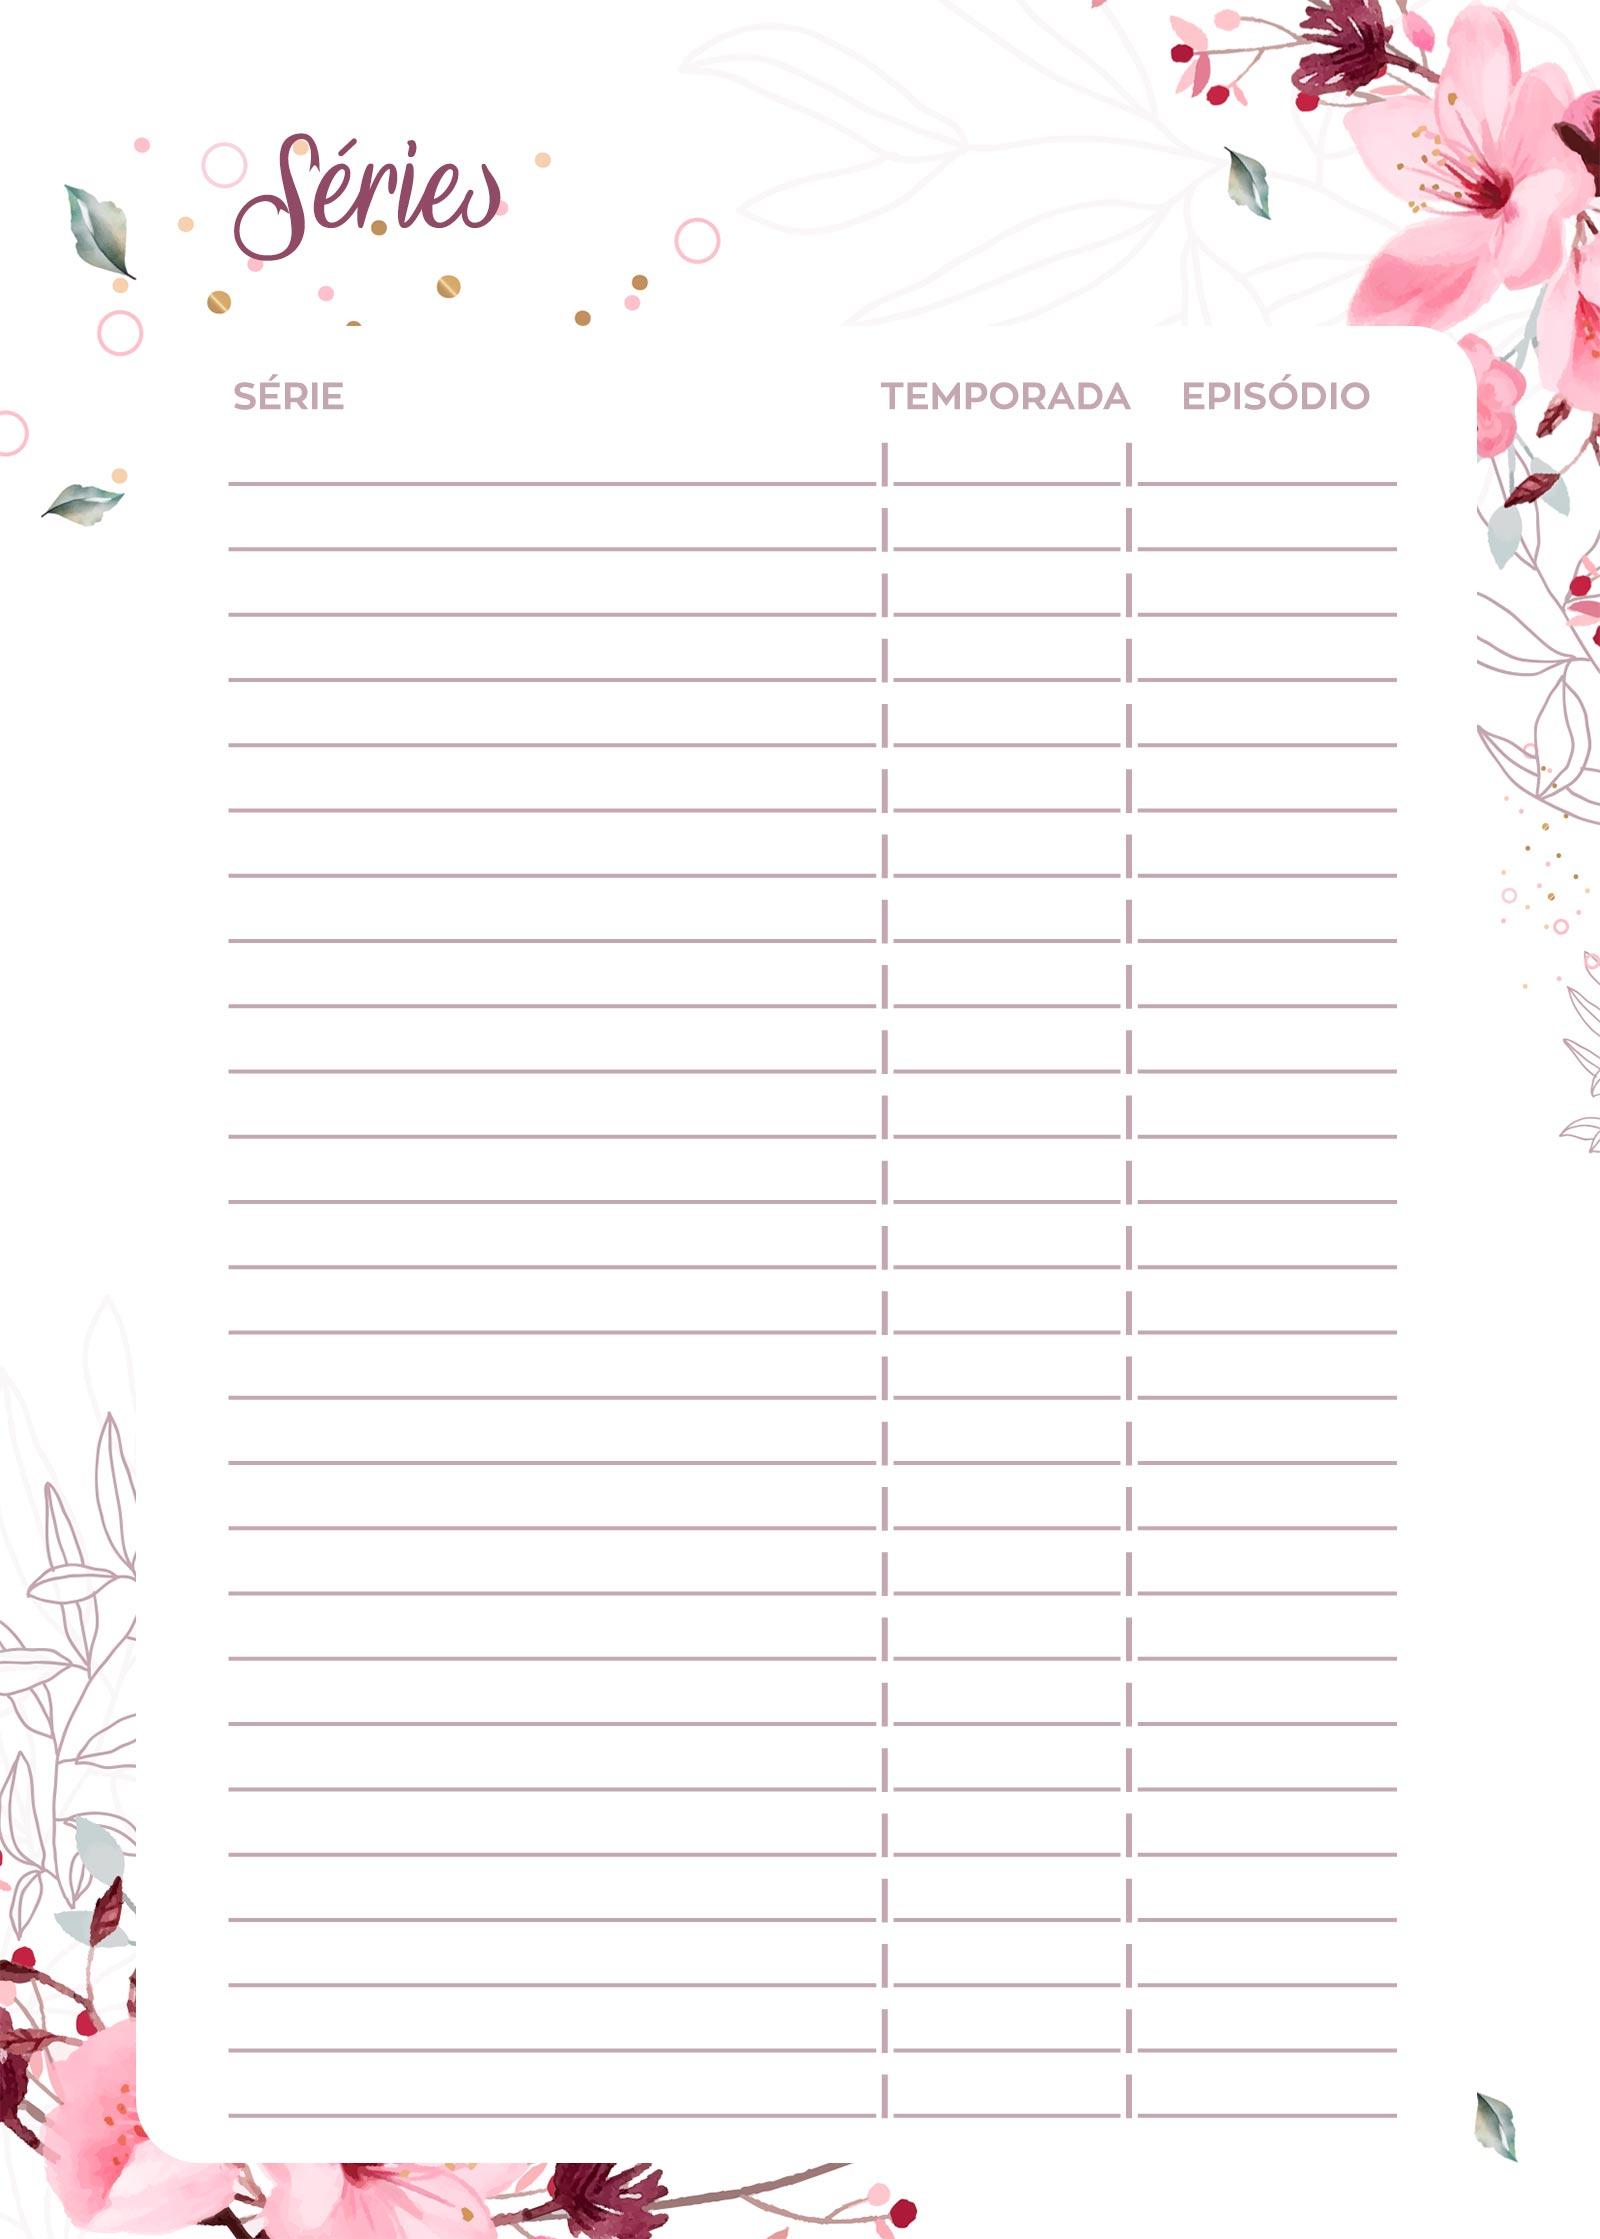 Planner 2020 Floral series